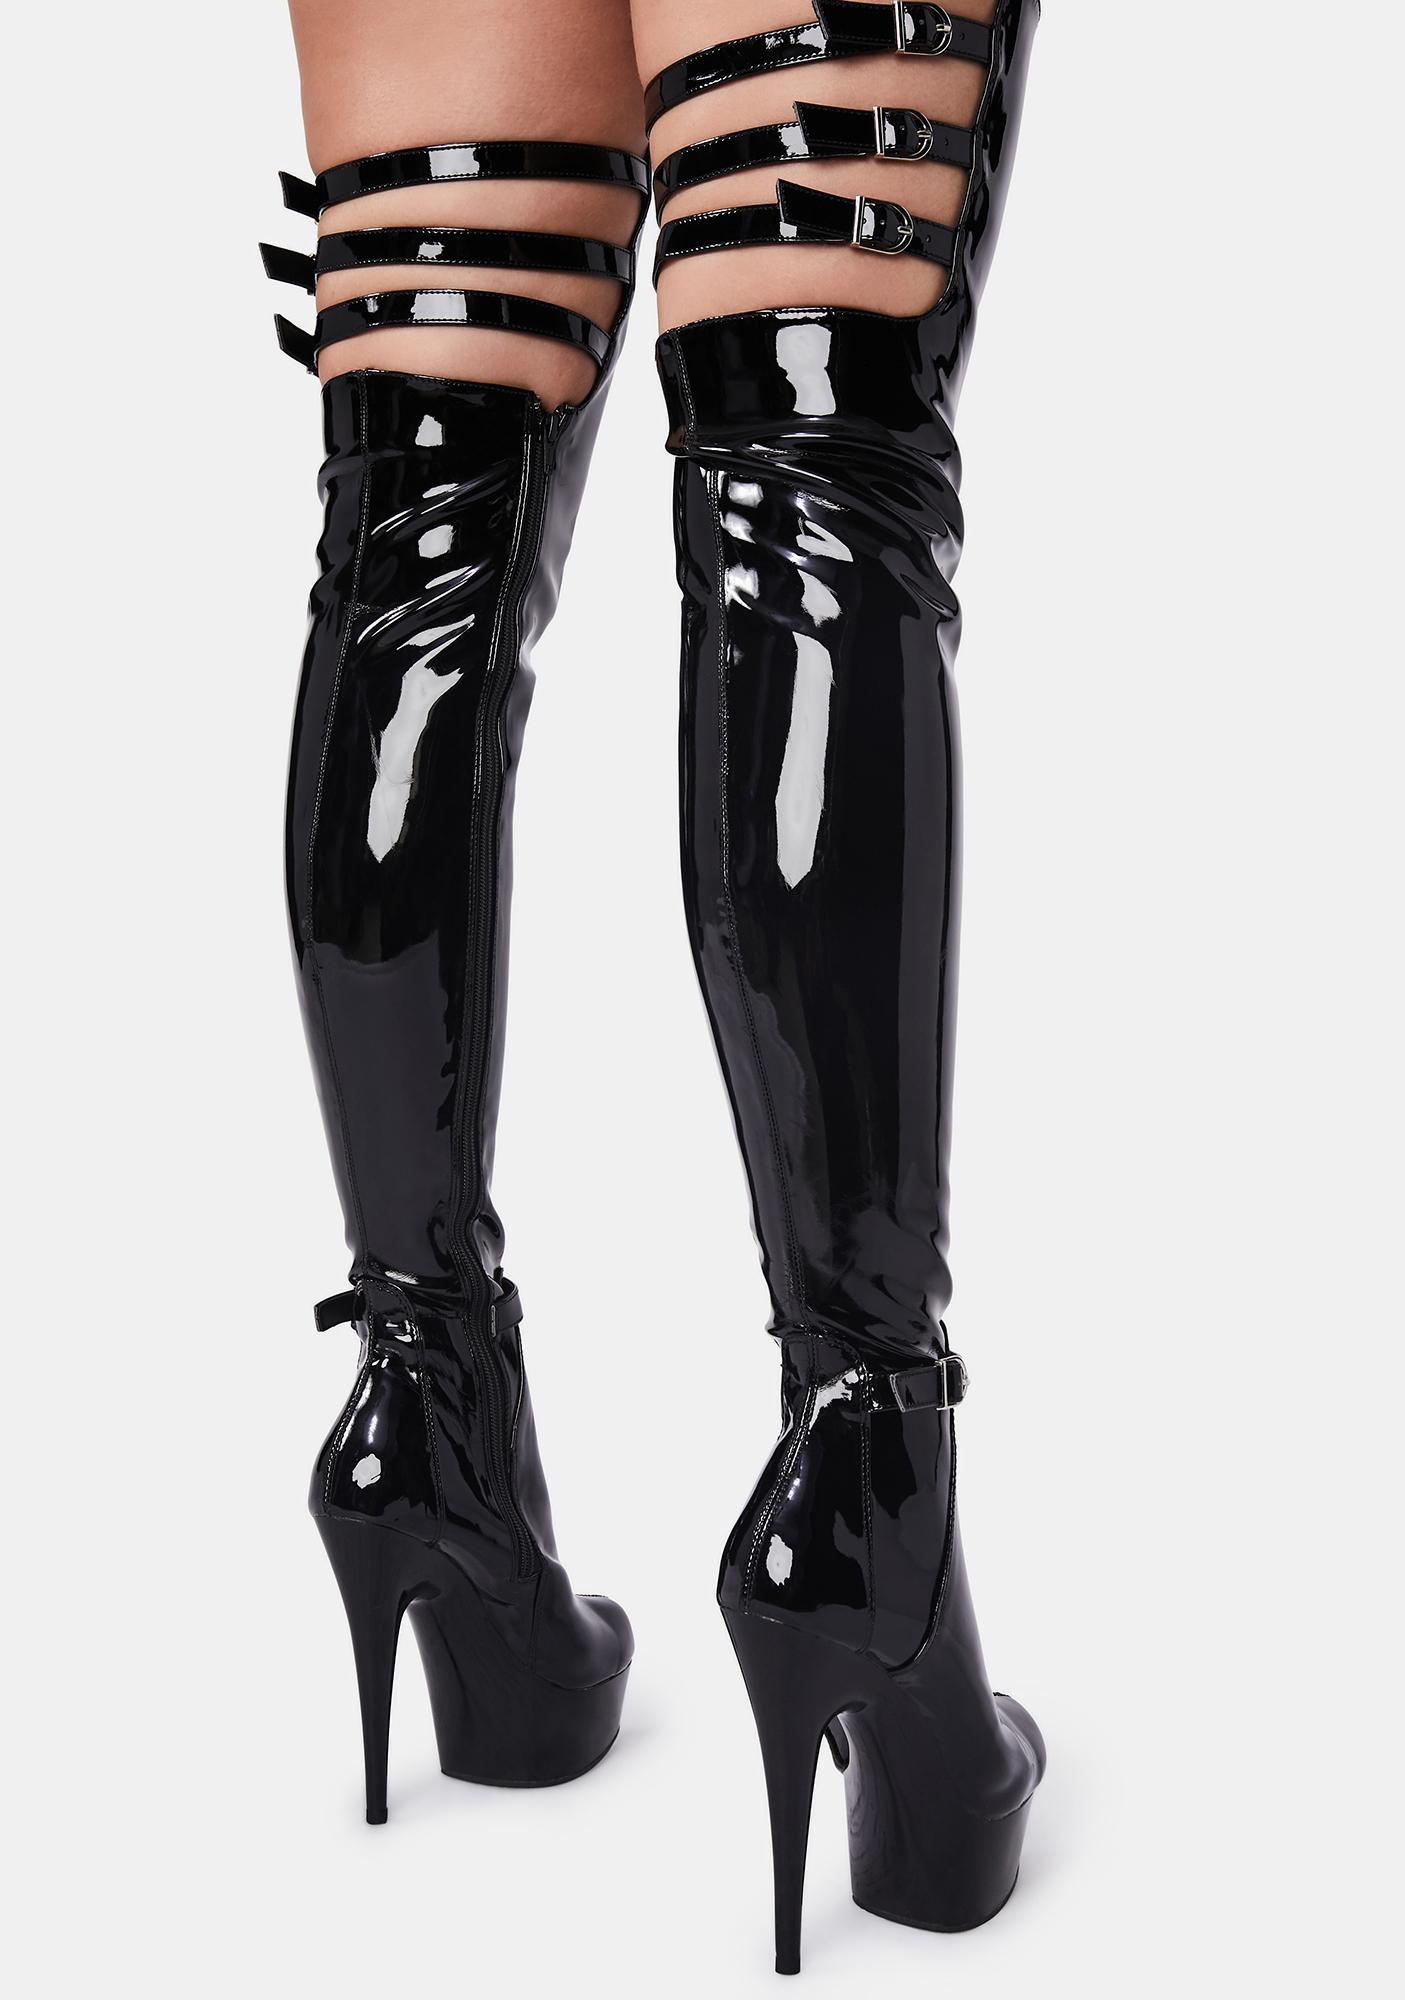 Pleaser Vixen Mission Thigh High Boots